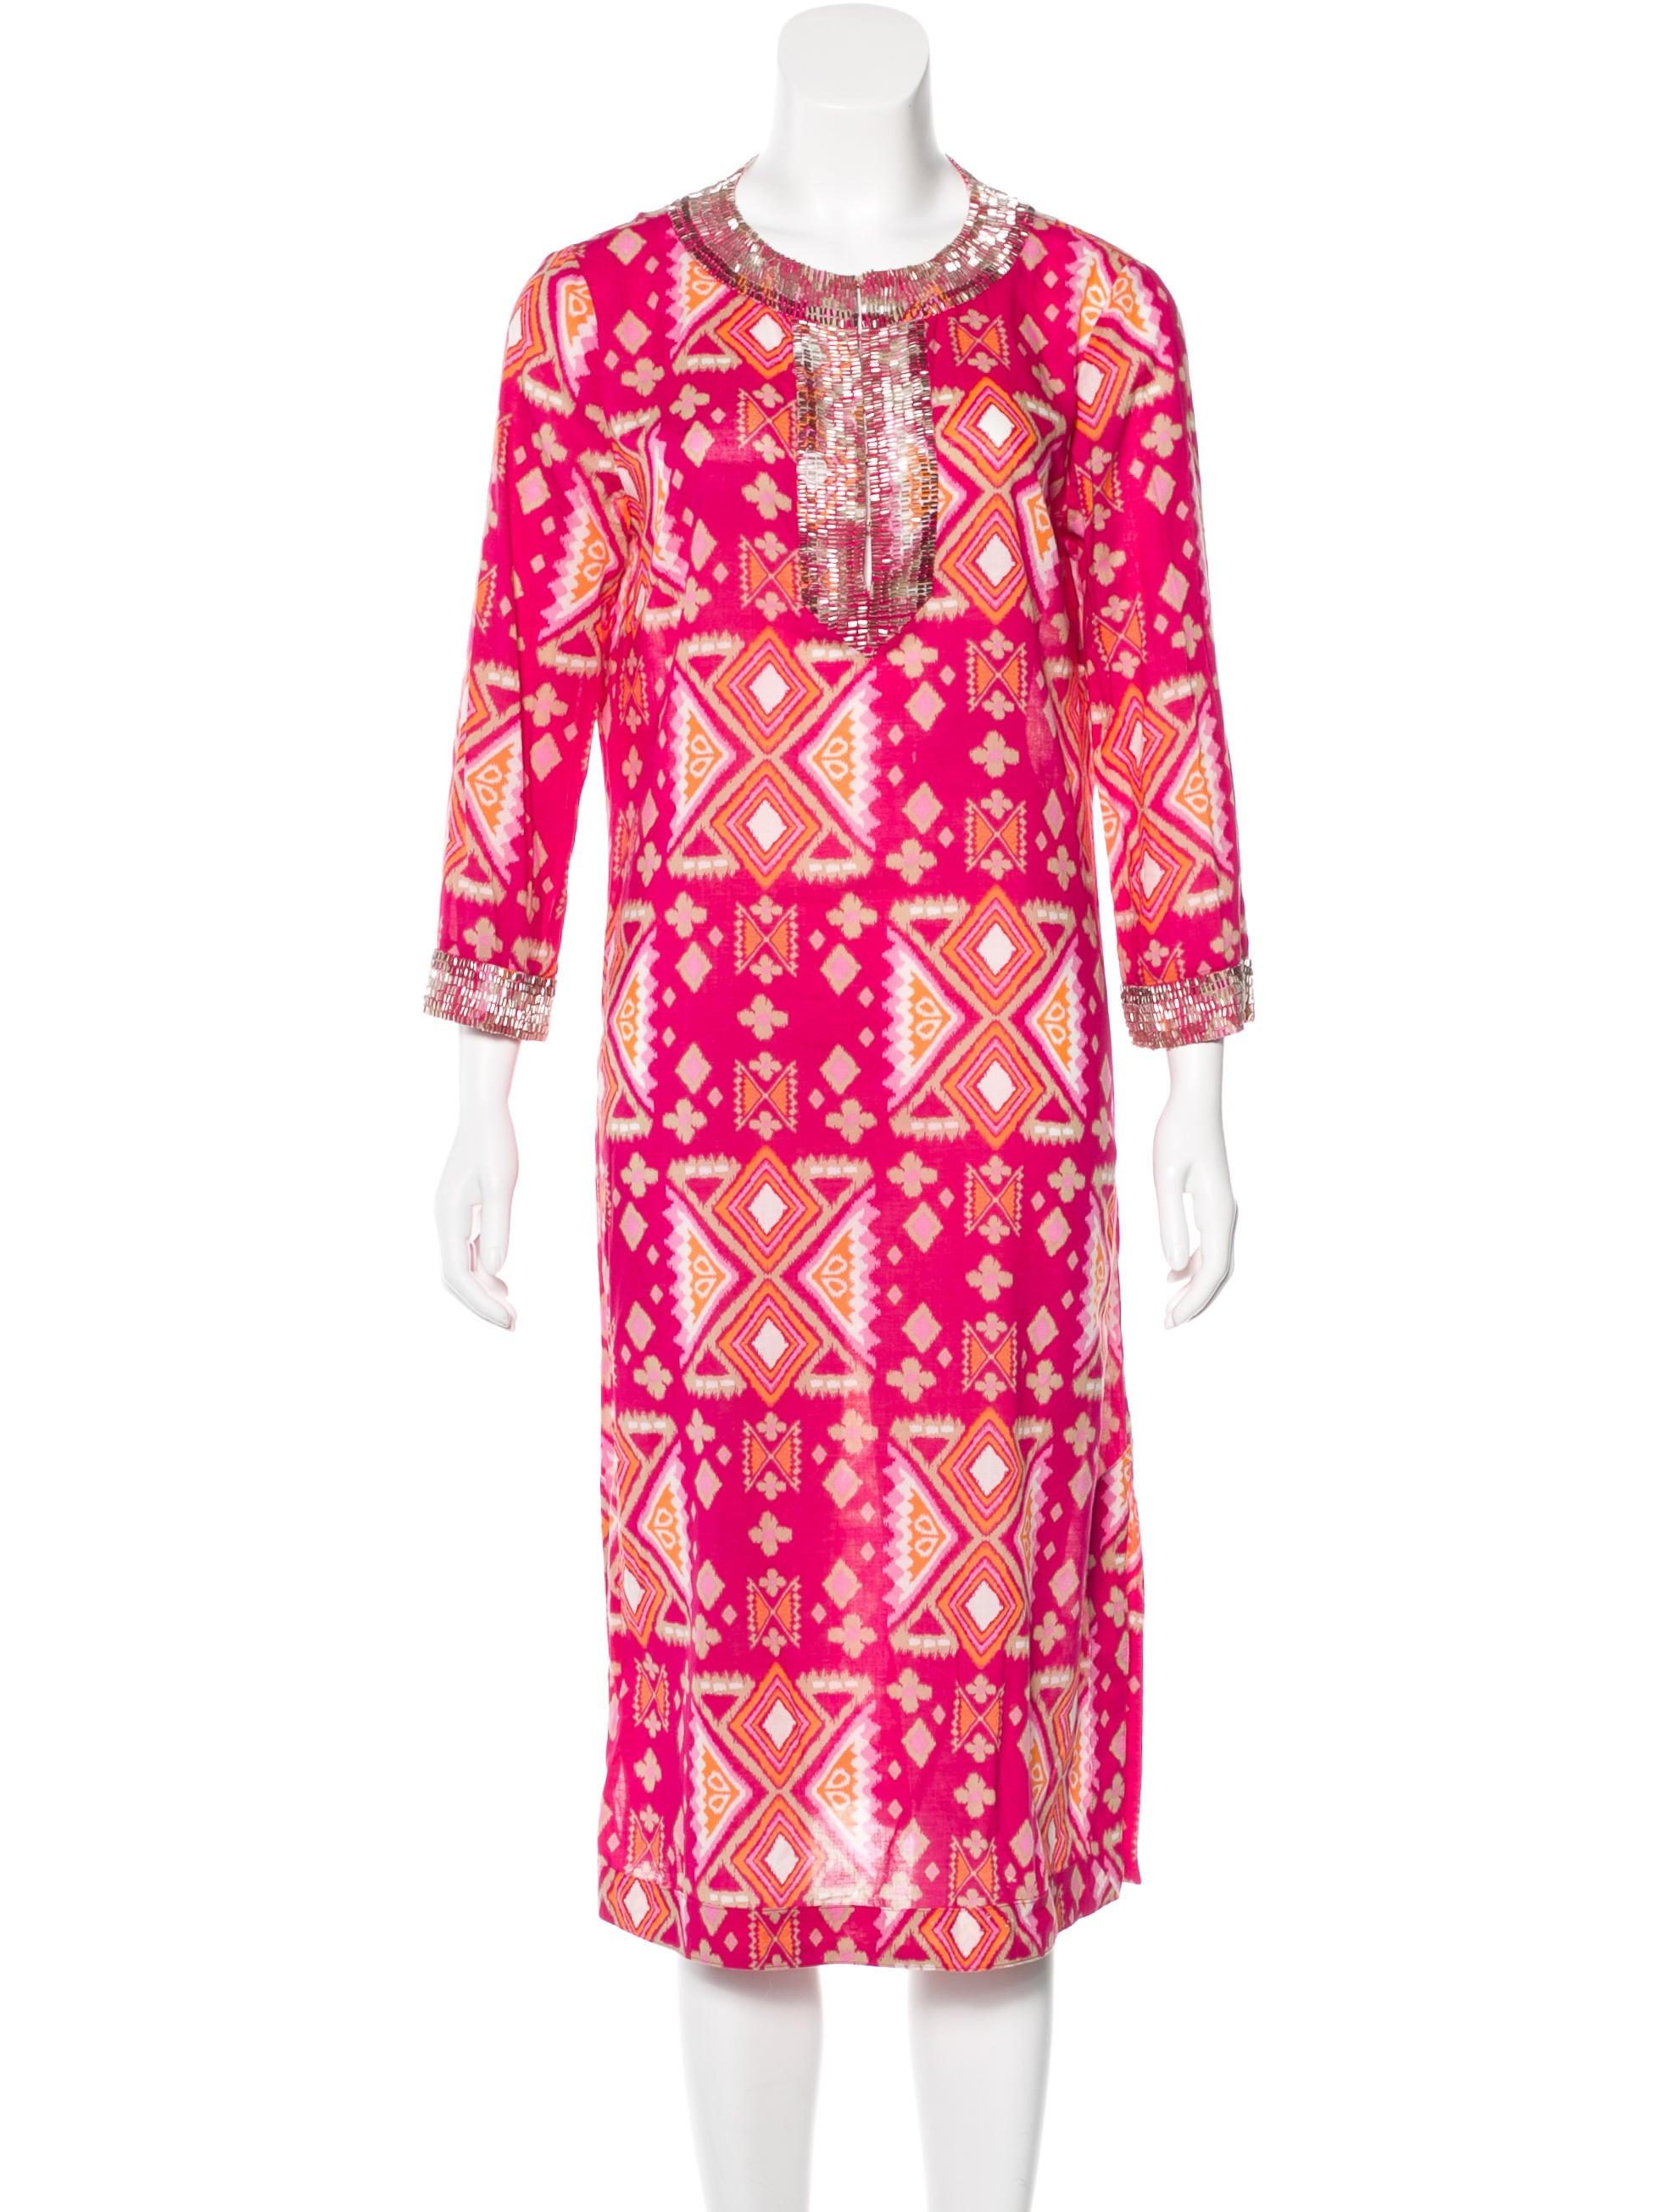 burch bead embellished midi dress clothing